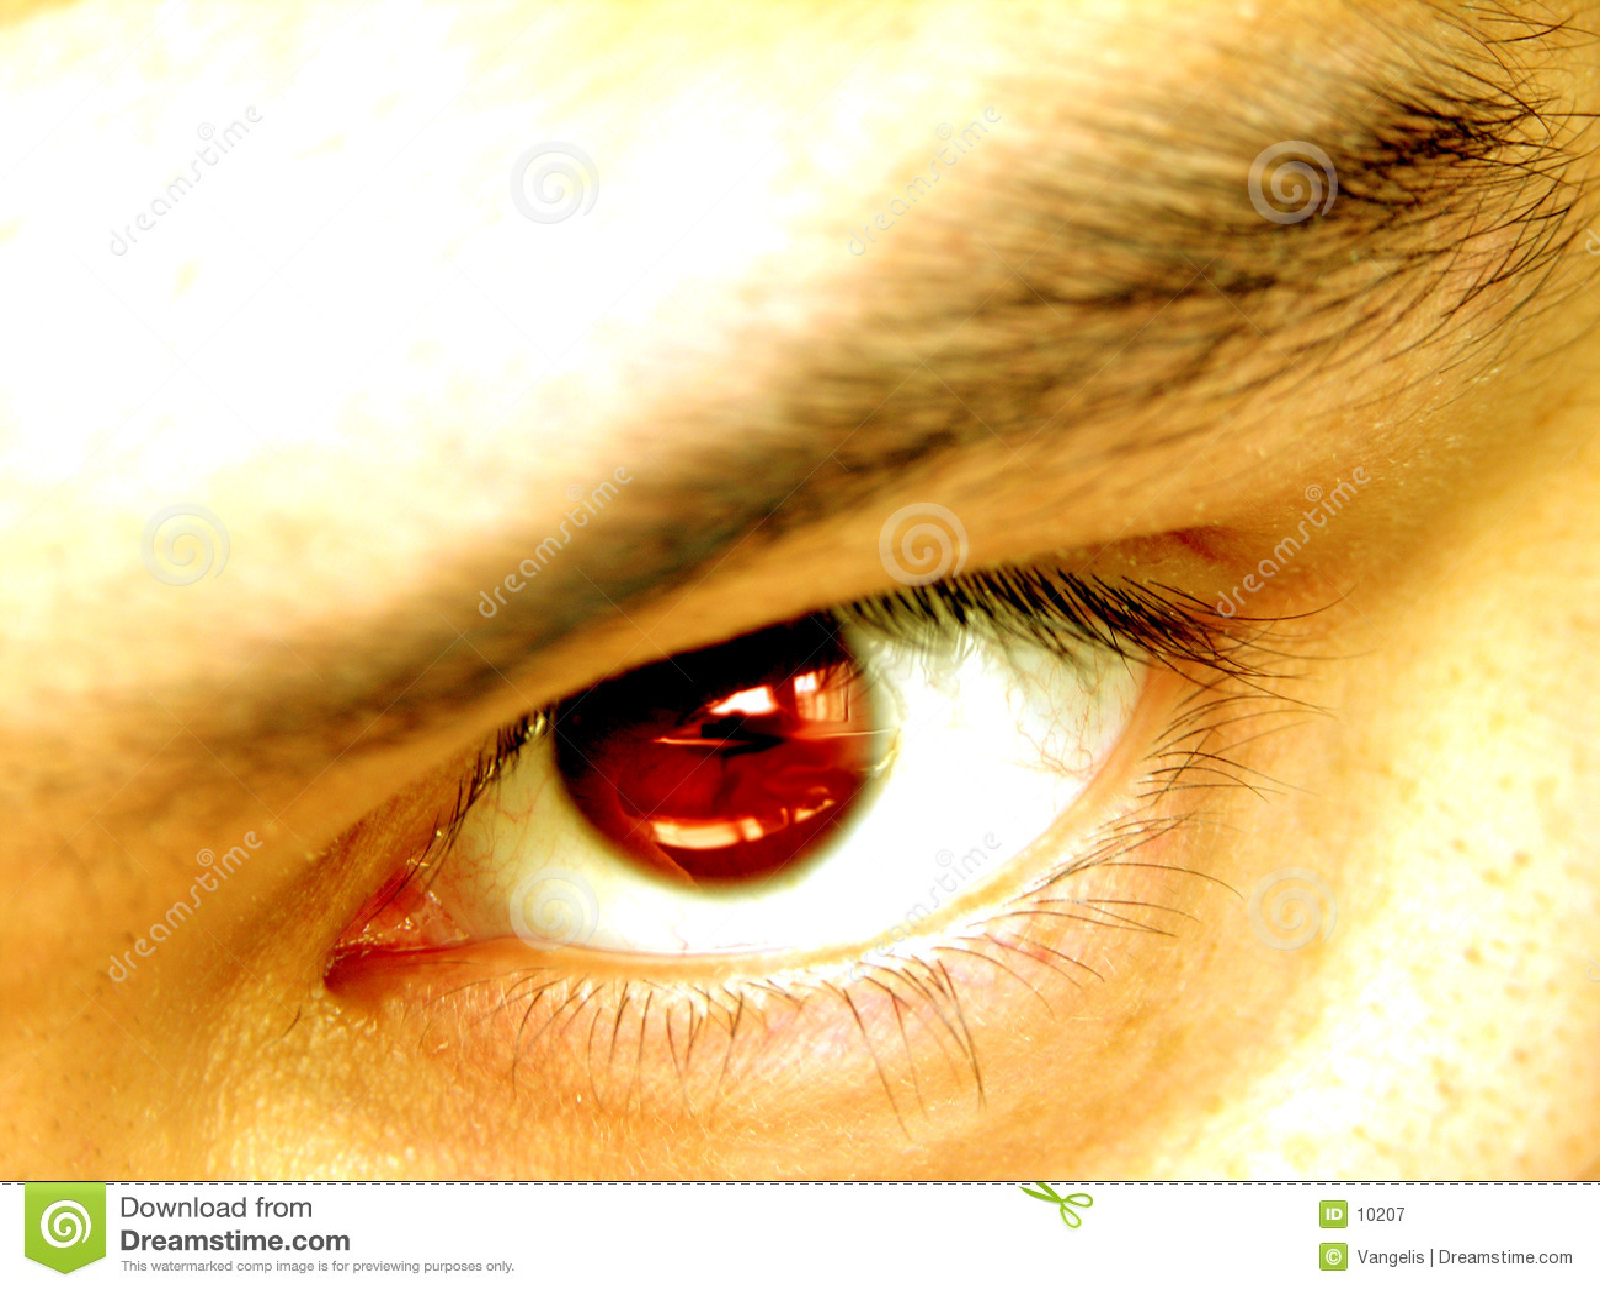 angry eyes man - photo #32